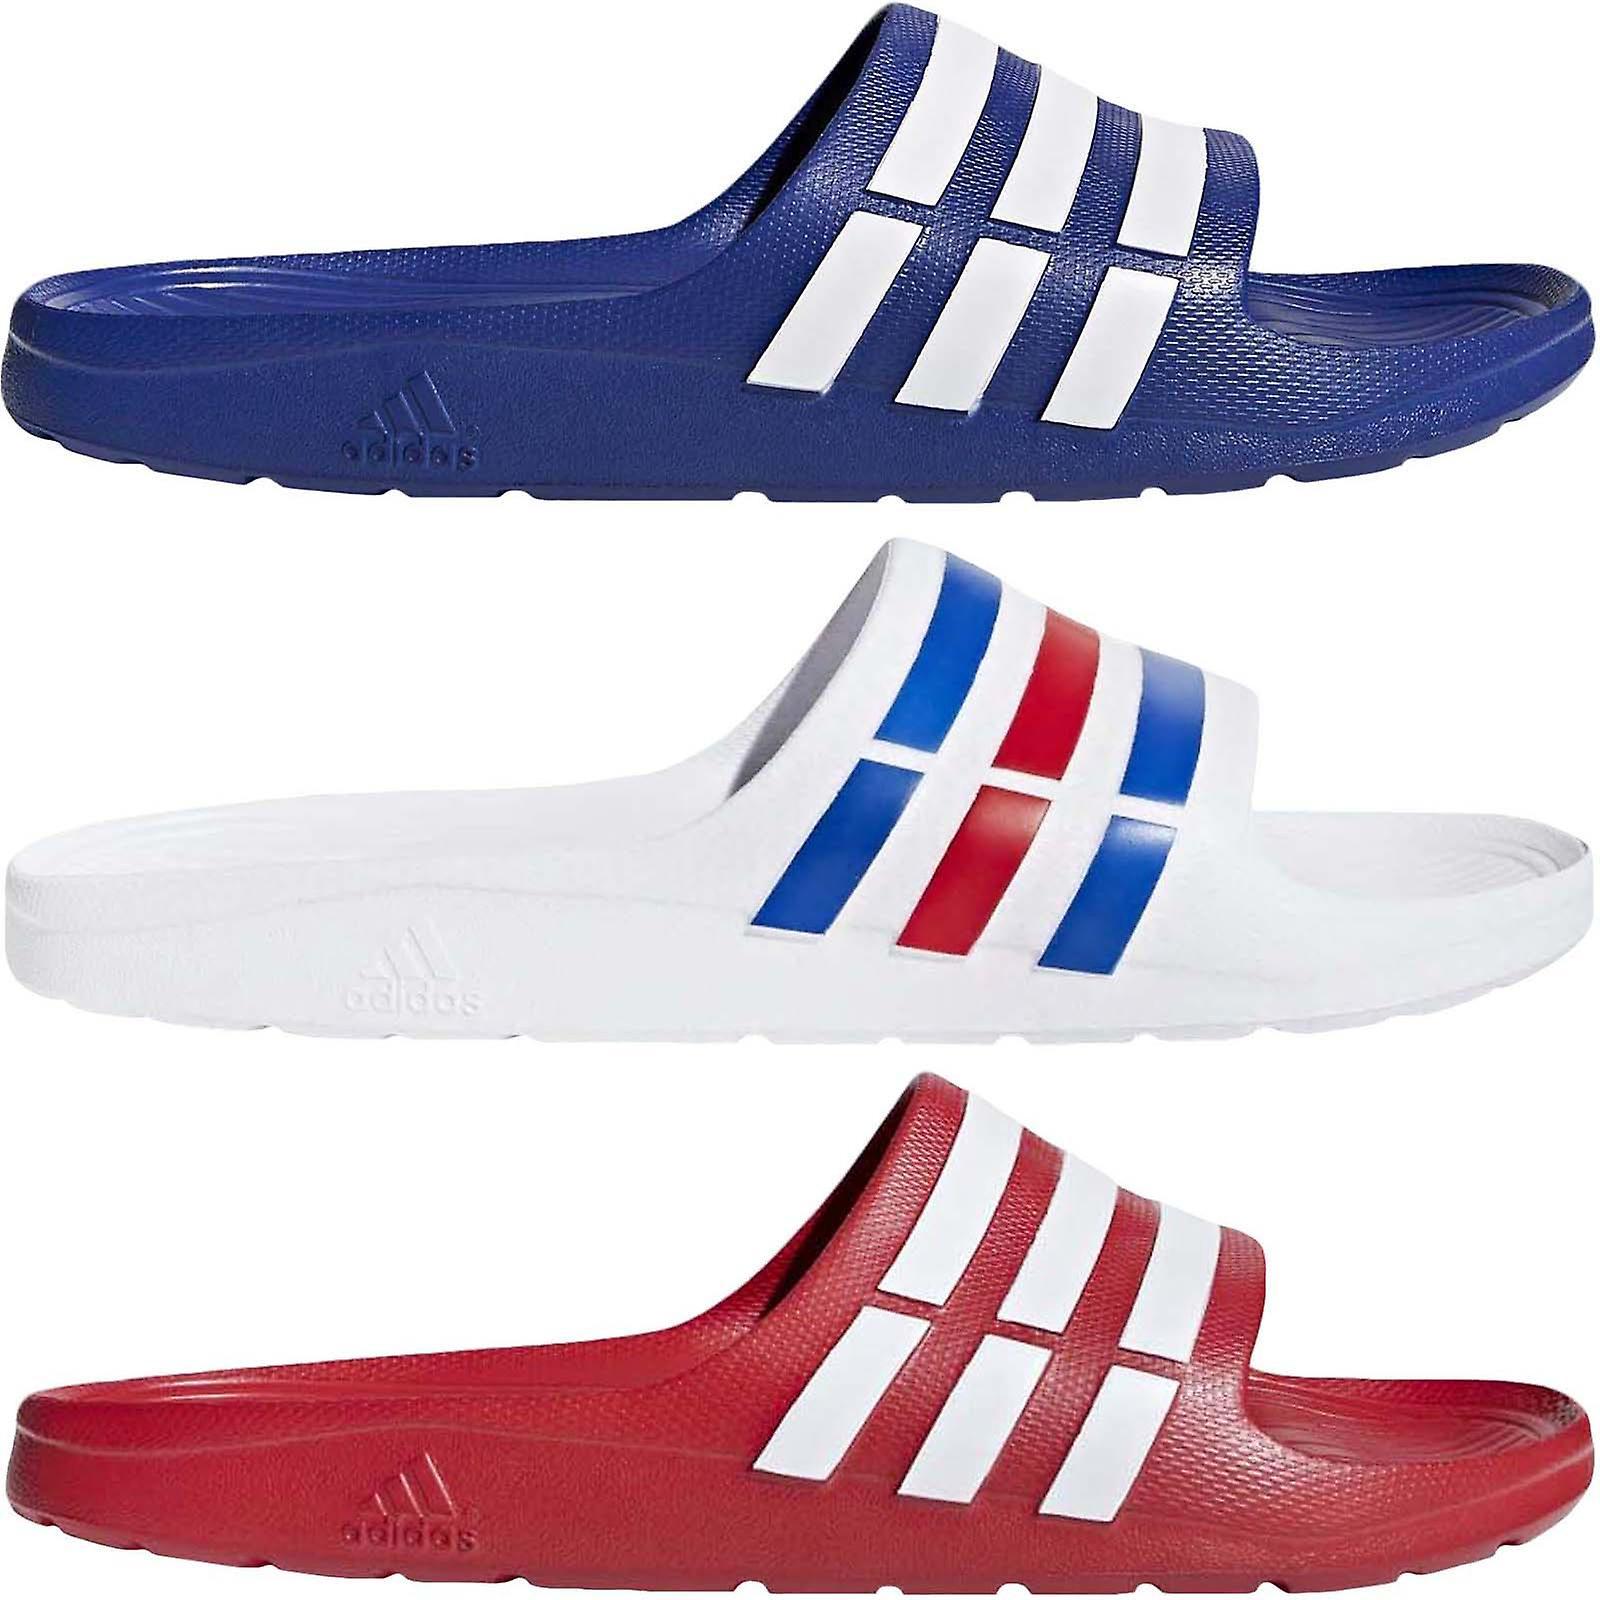 Mens Tassel Shoes Fashion New Mens Shoes Loafers Retro suya Brand Mens Shoes Green 7.5 M US